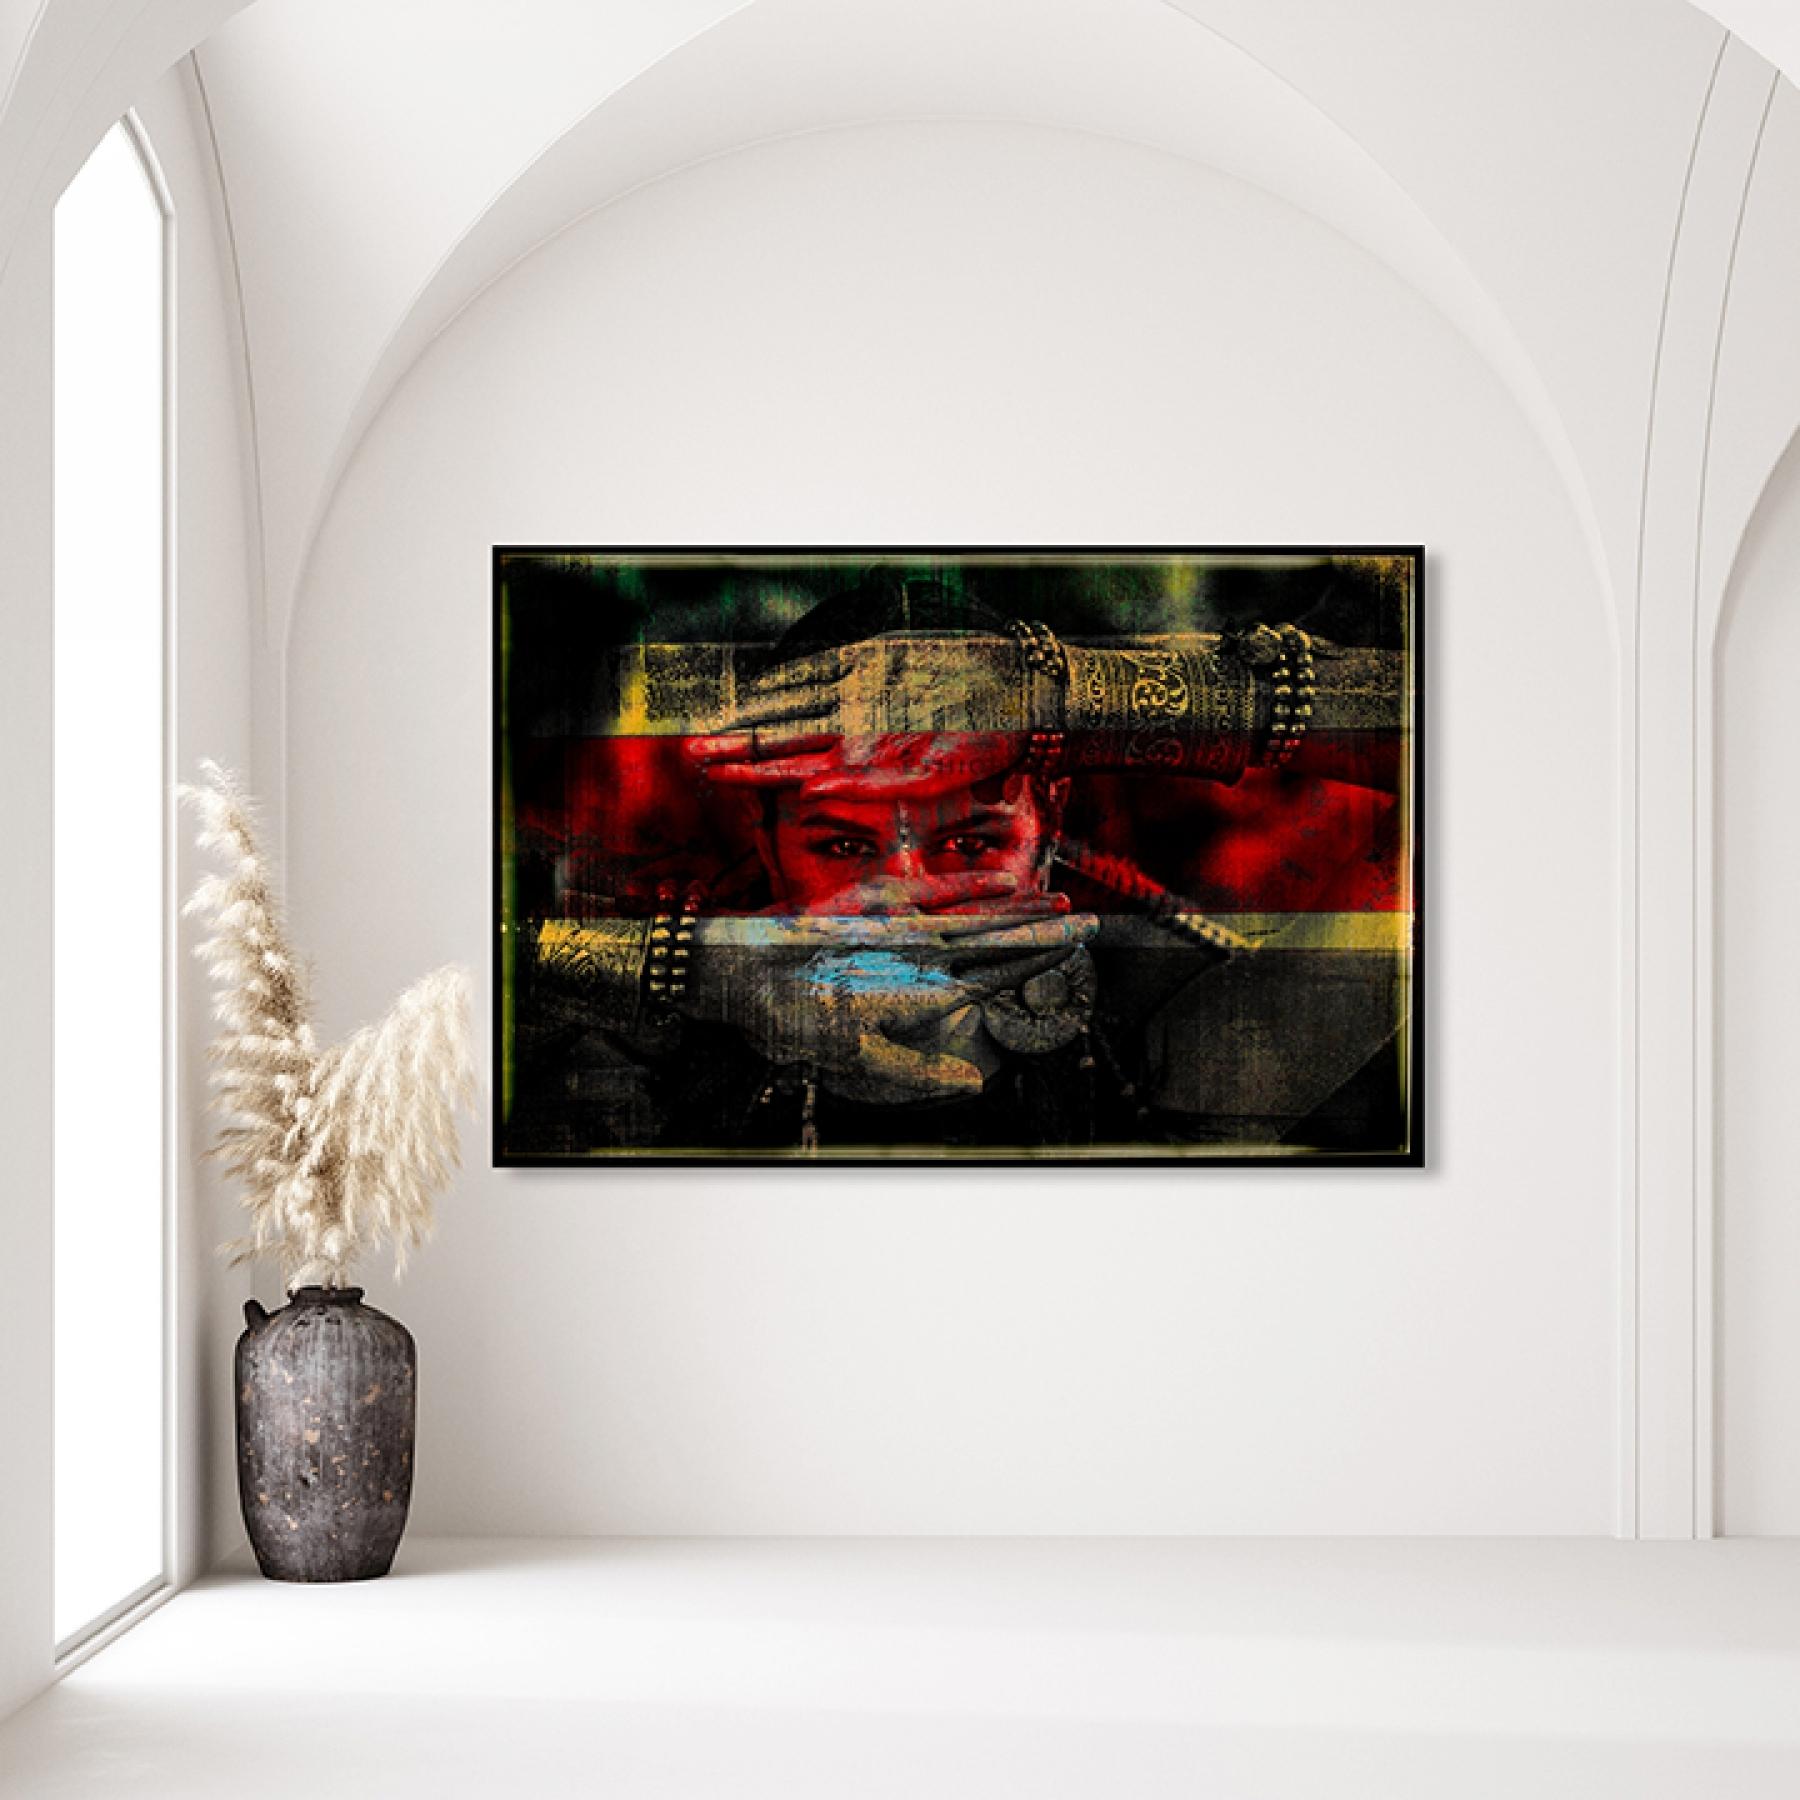 ETNICA frame